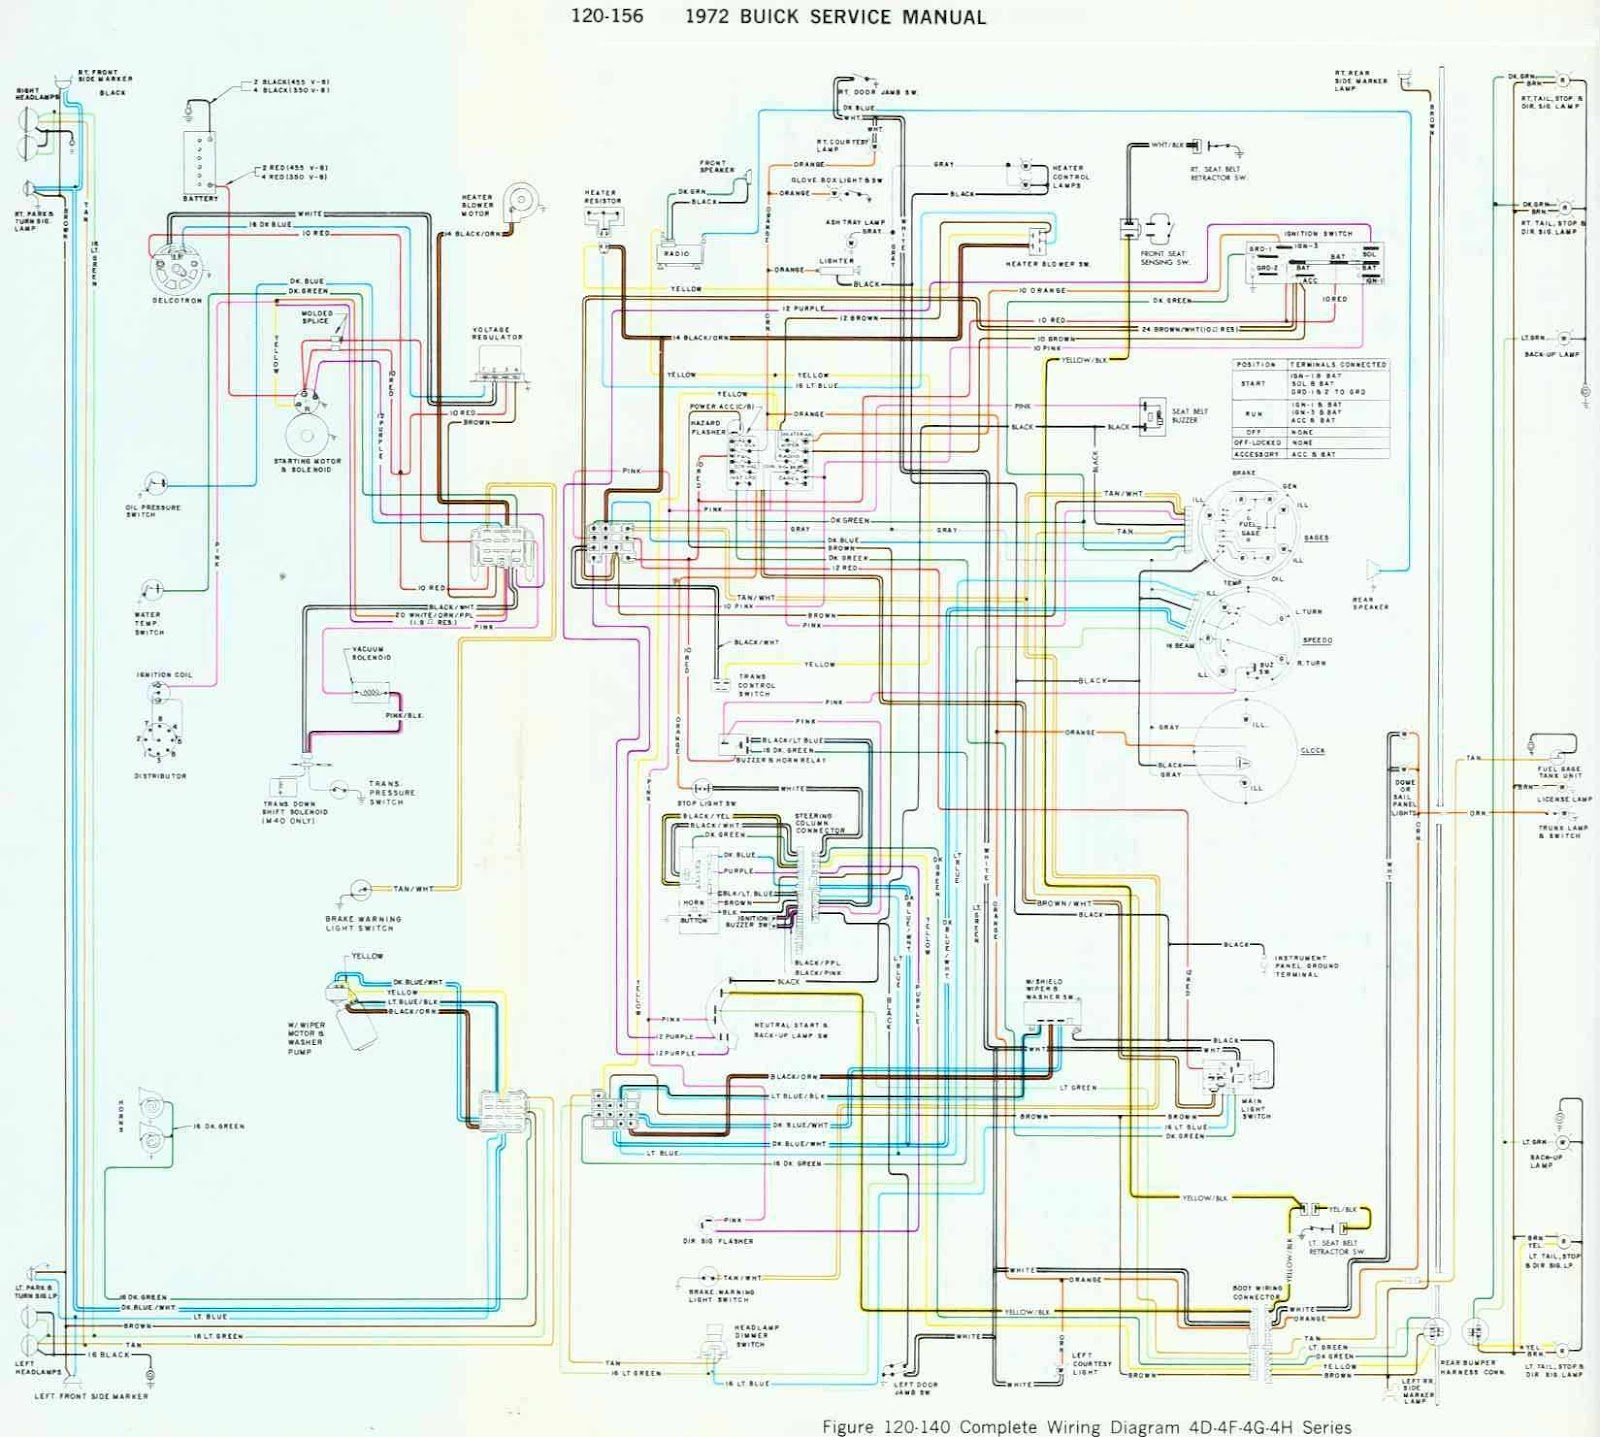 wiring diagram 1992 buick regal smart wiring diagrams u2022 rh emgsolutions co 2000 Buick Century Fuse Box 1999 Buick Century Wiring-Diagram